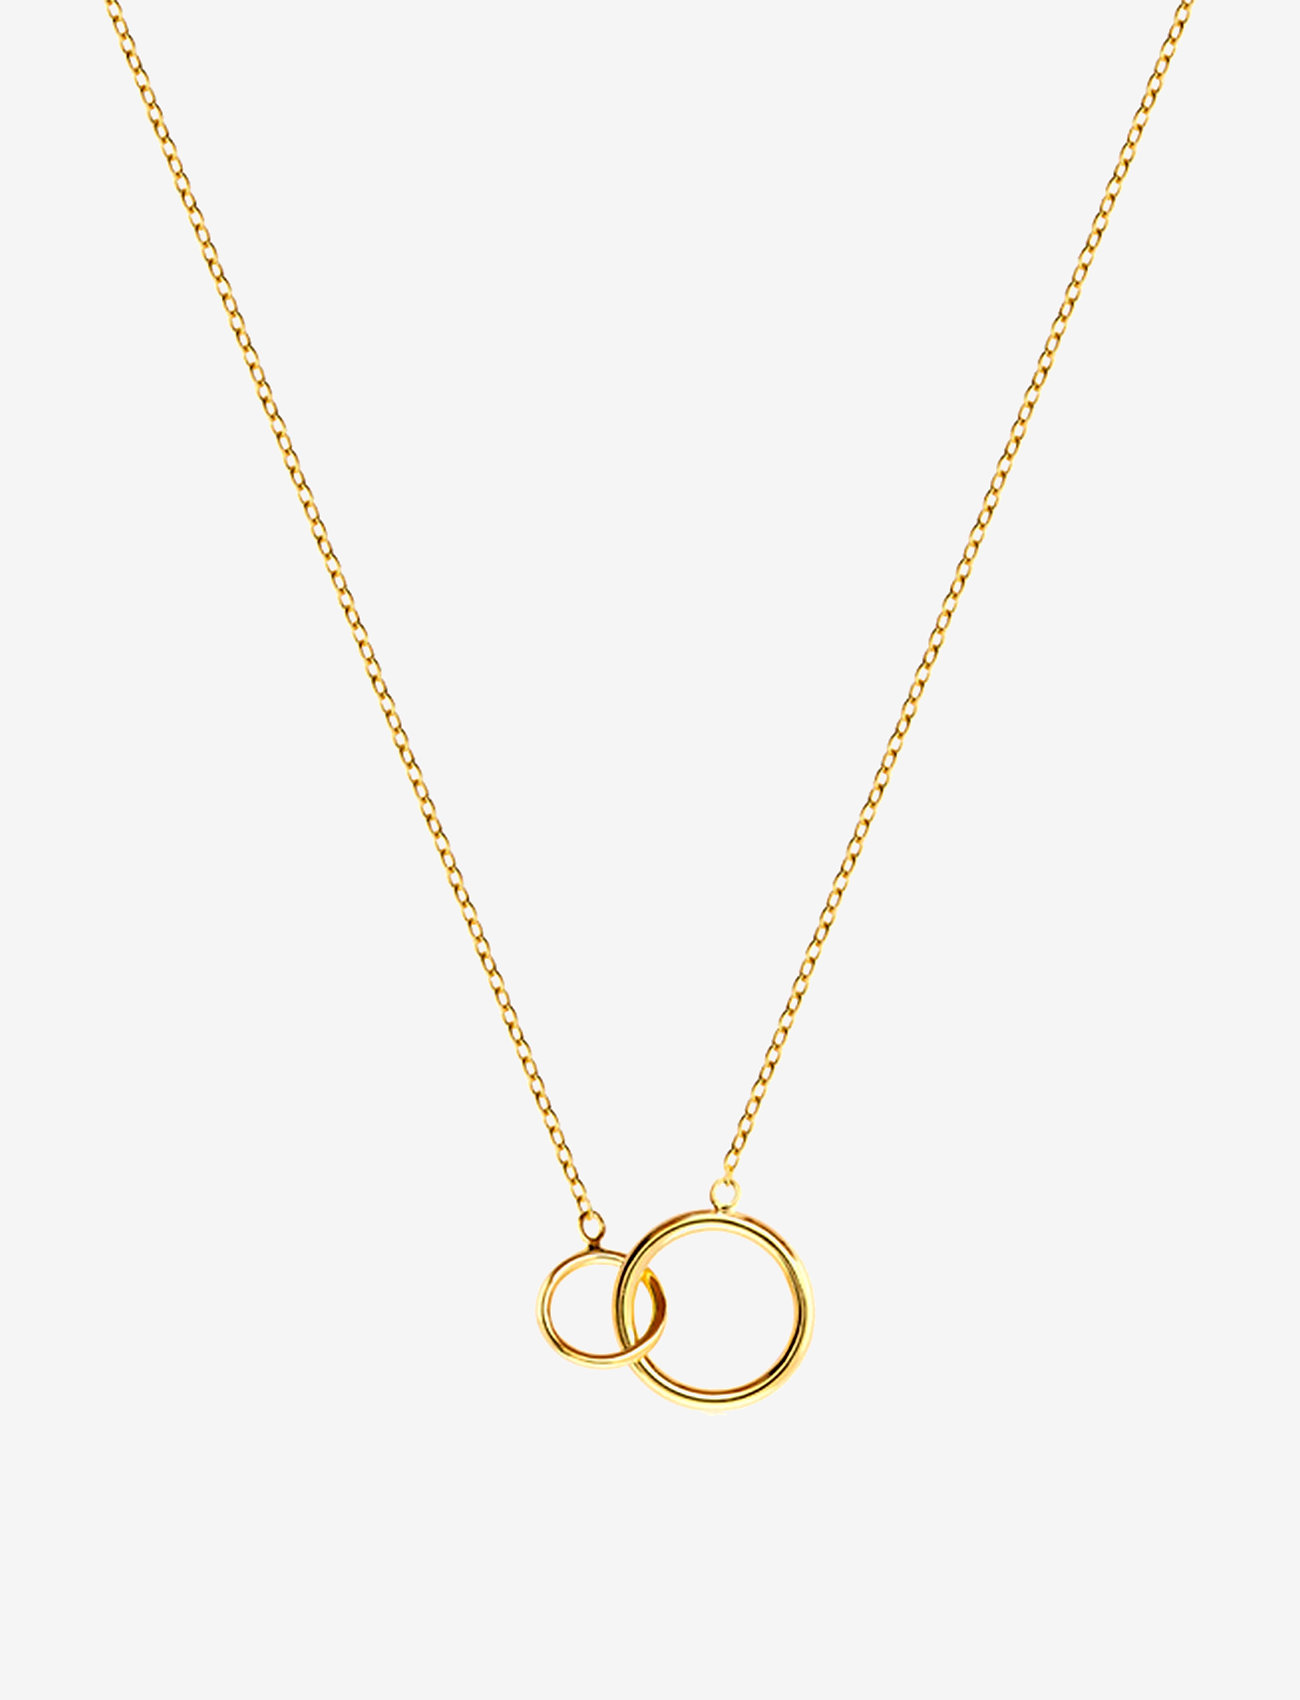 SOPHIE by SOPHIE - Mini circle necklace - kaklarotas ar kulonu - gold - 0